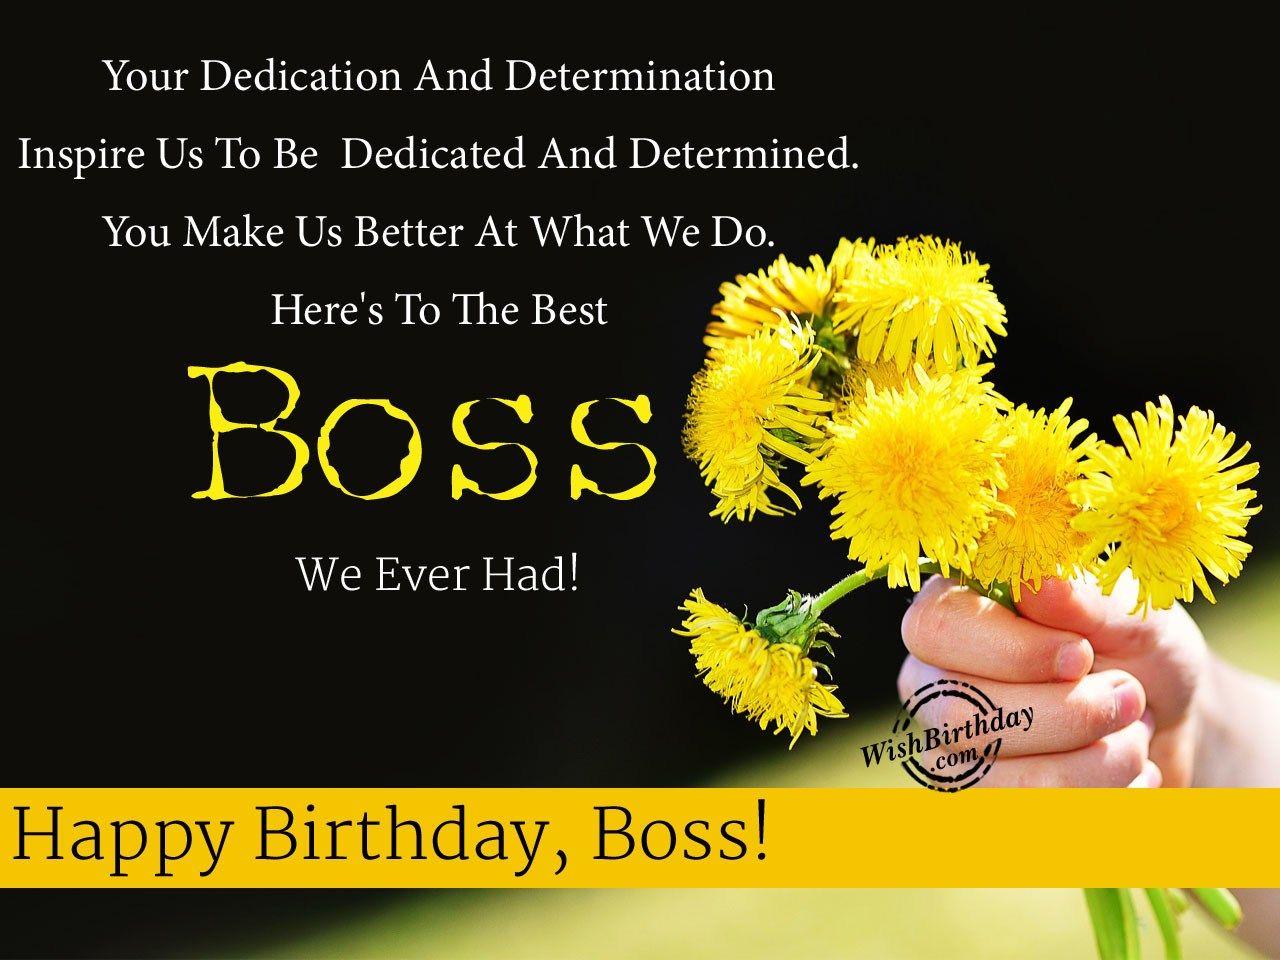 Happy Birthday Wishes For Boss Happy birthday wishes